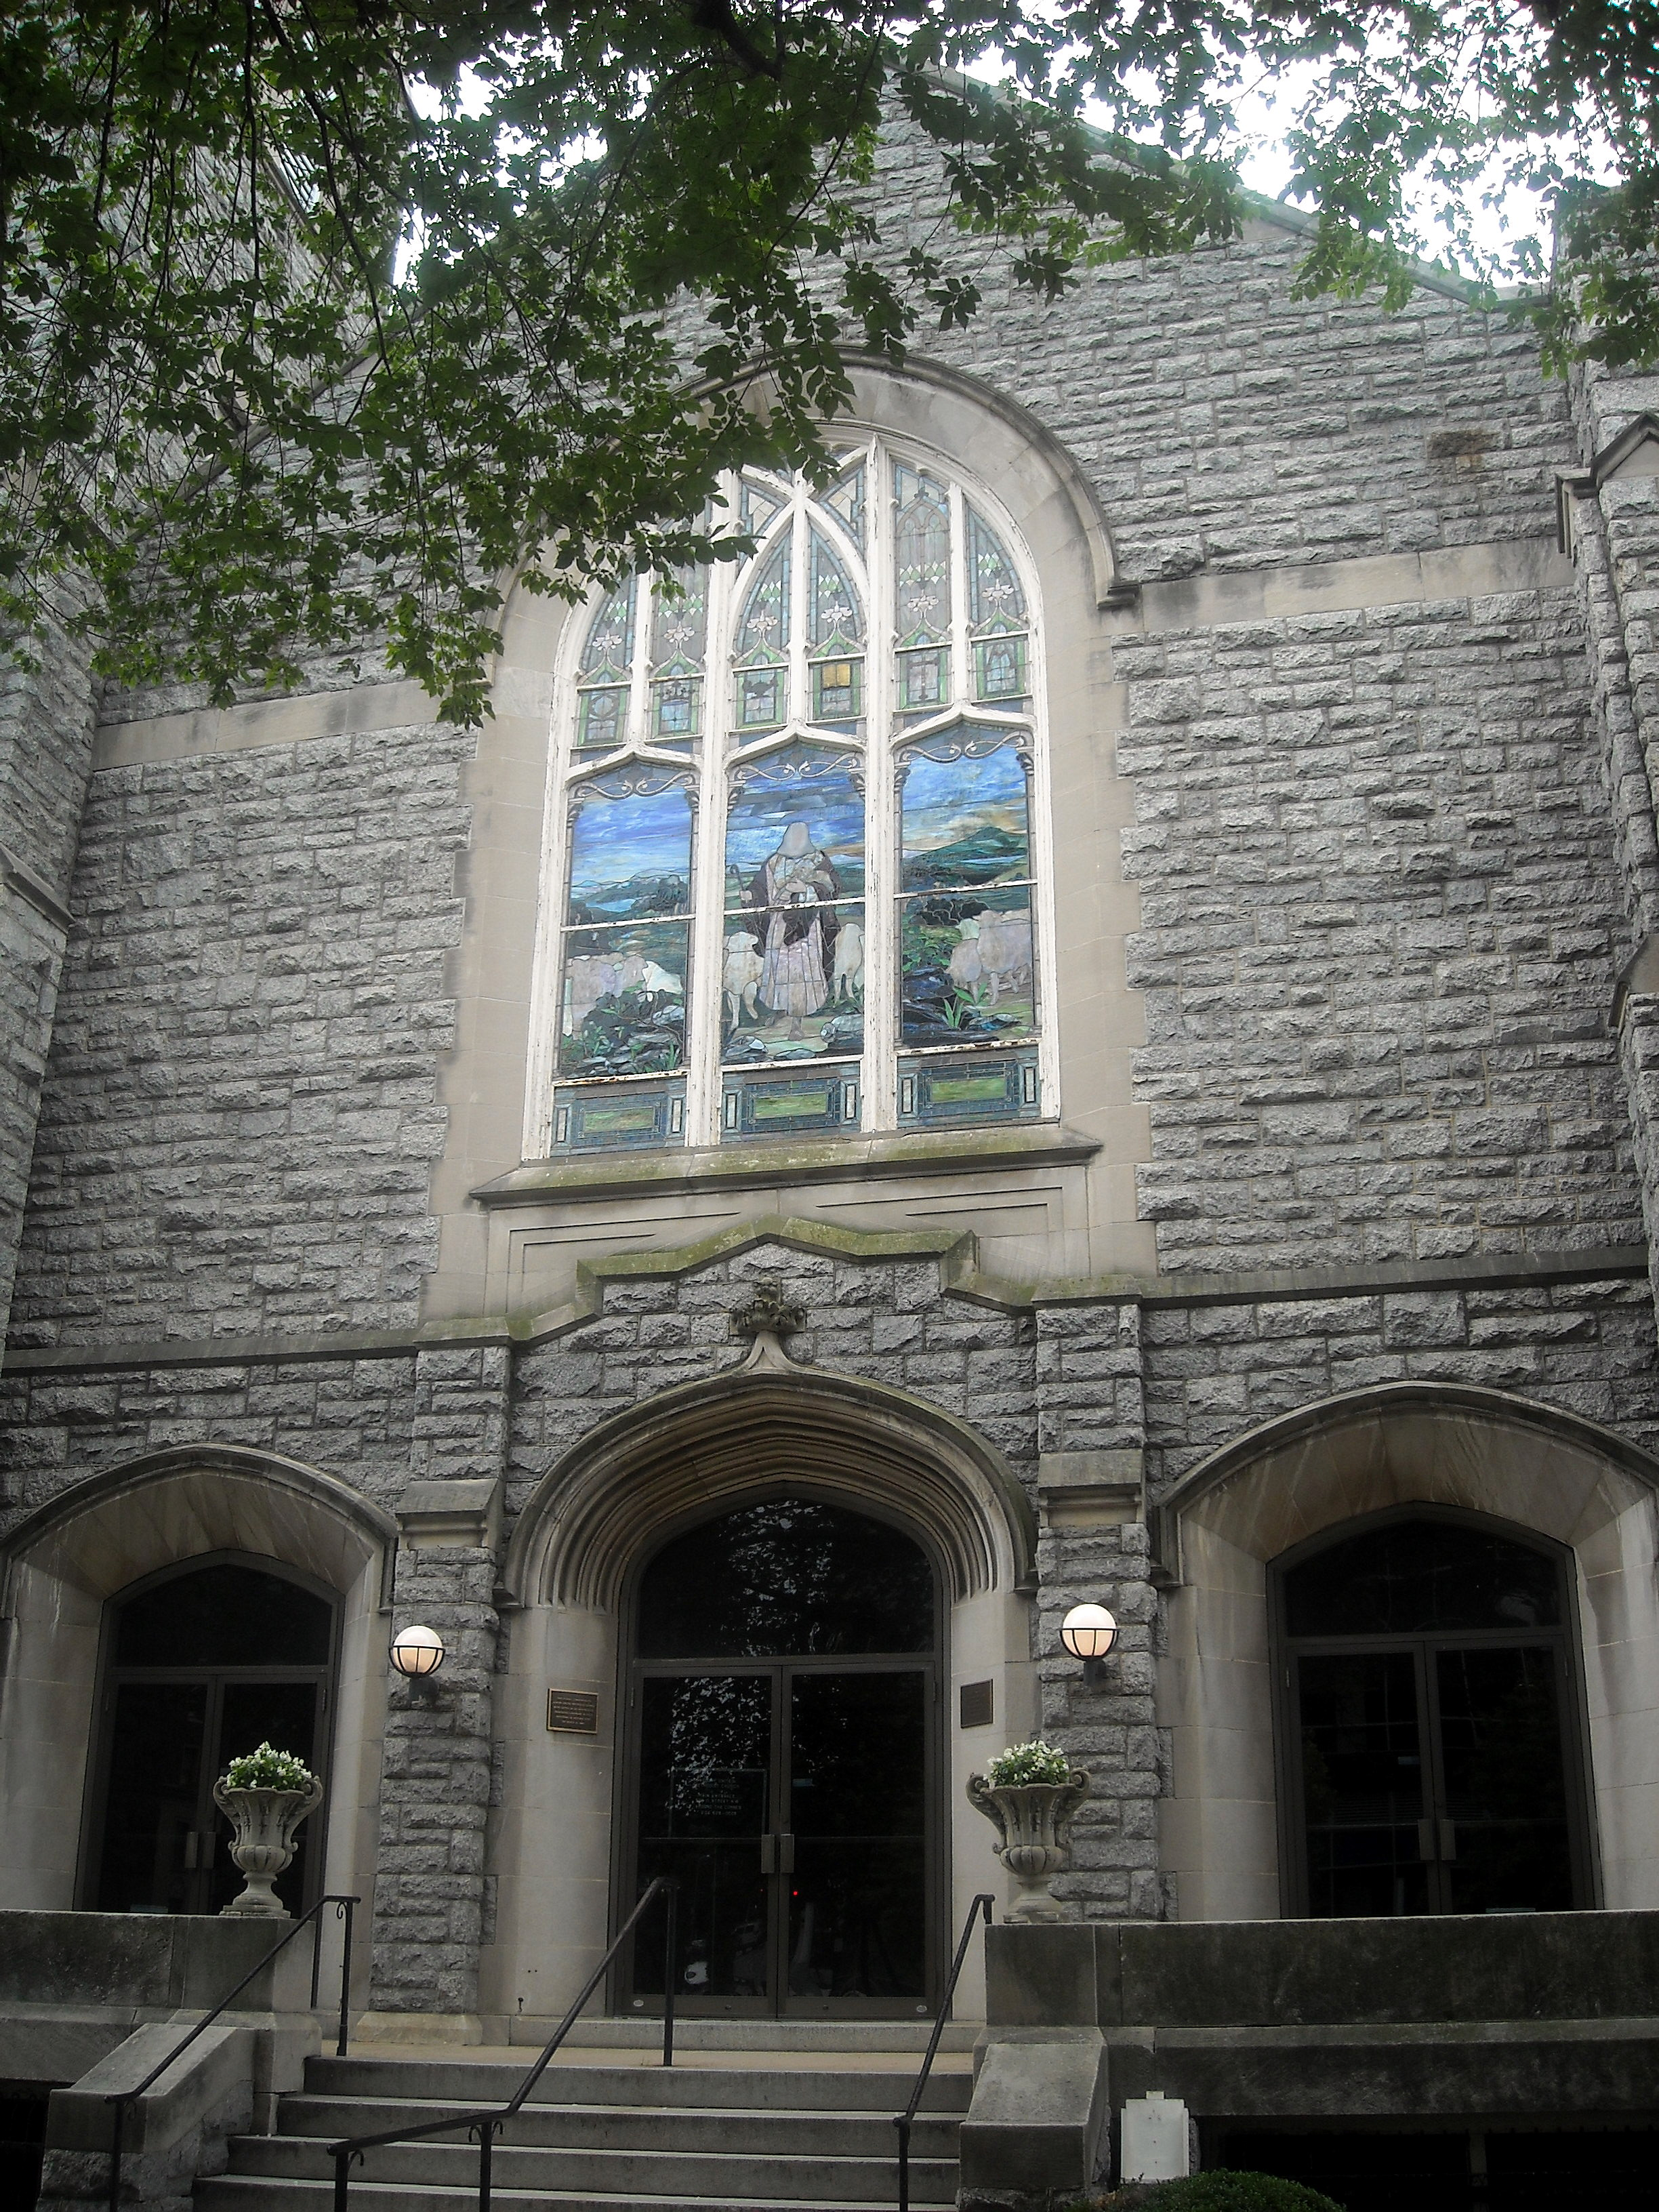 Asbury United Methodist Church - Washington, D.C.